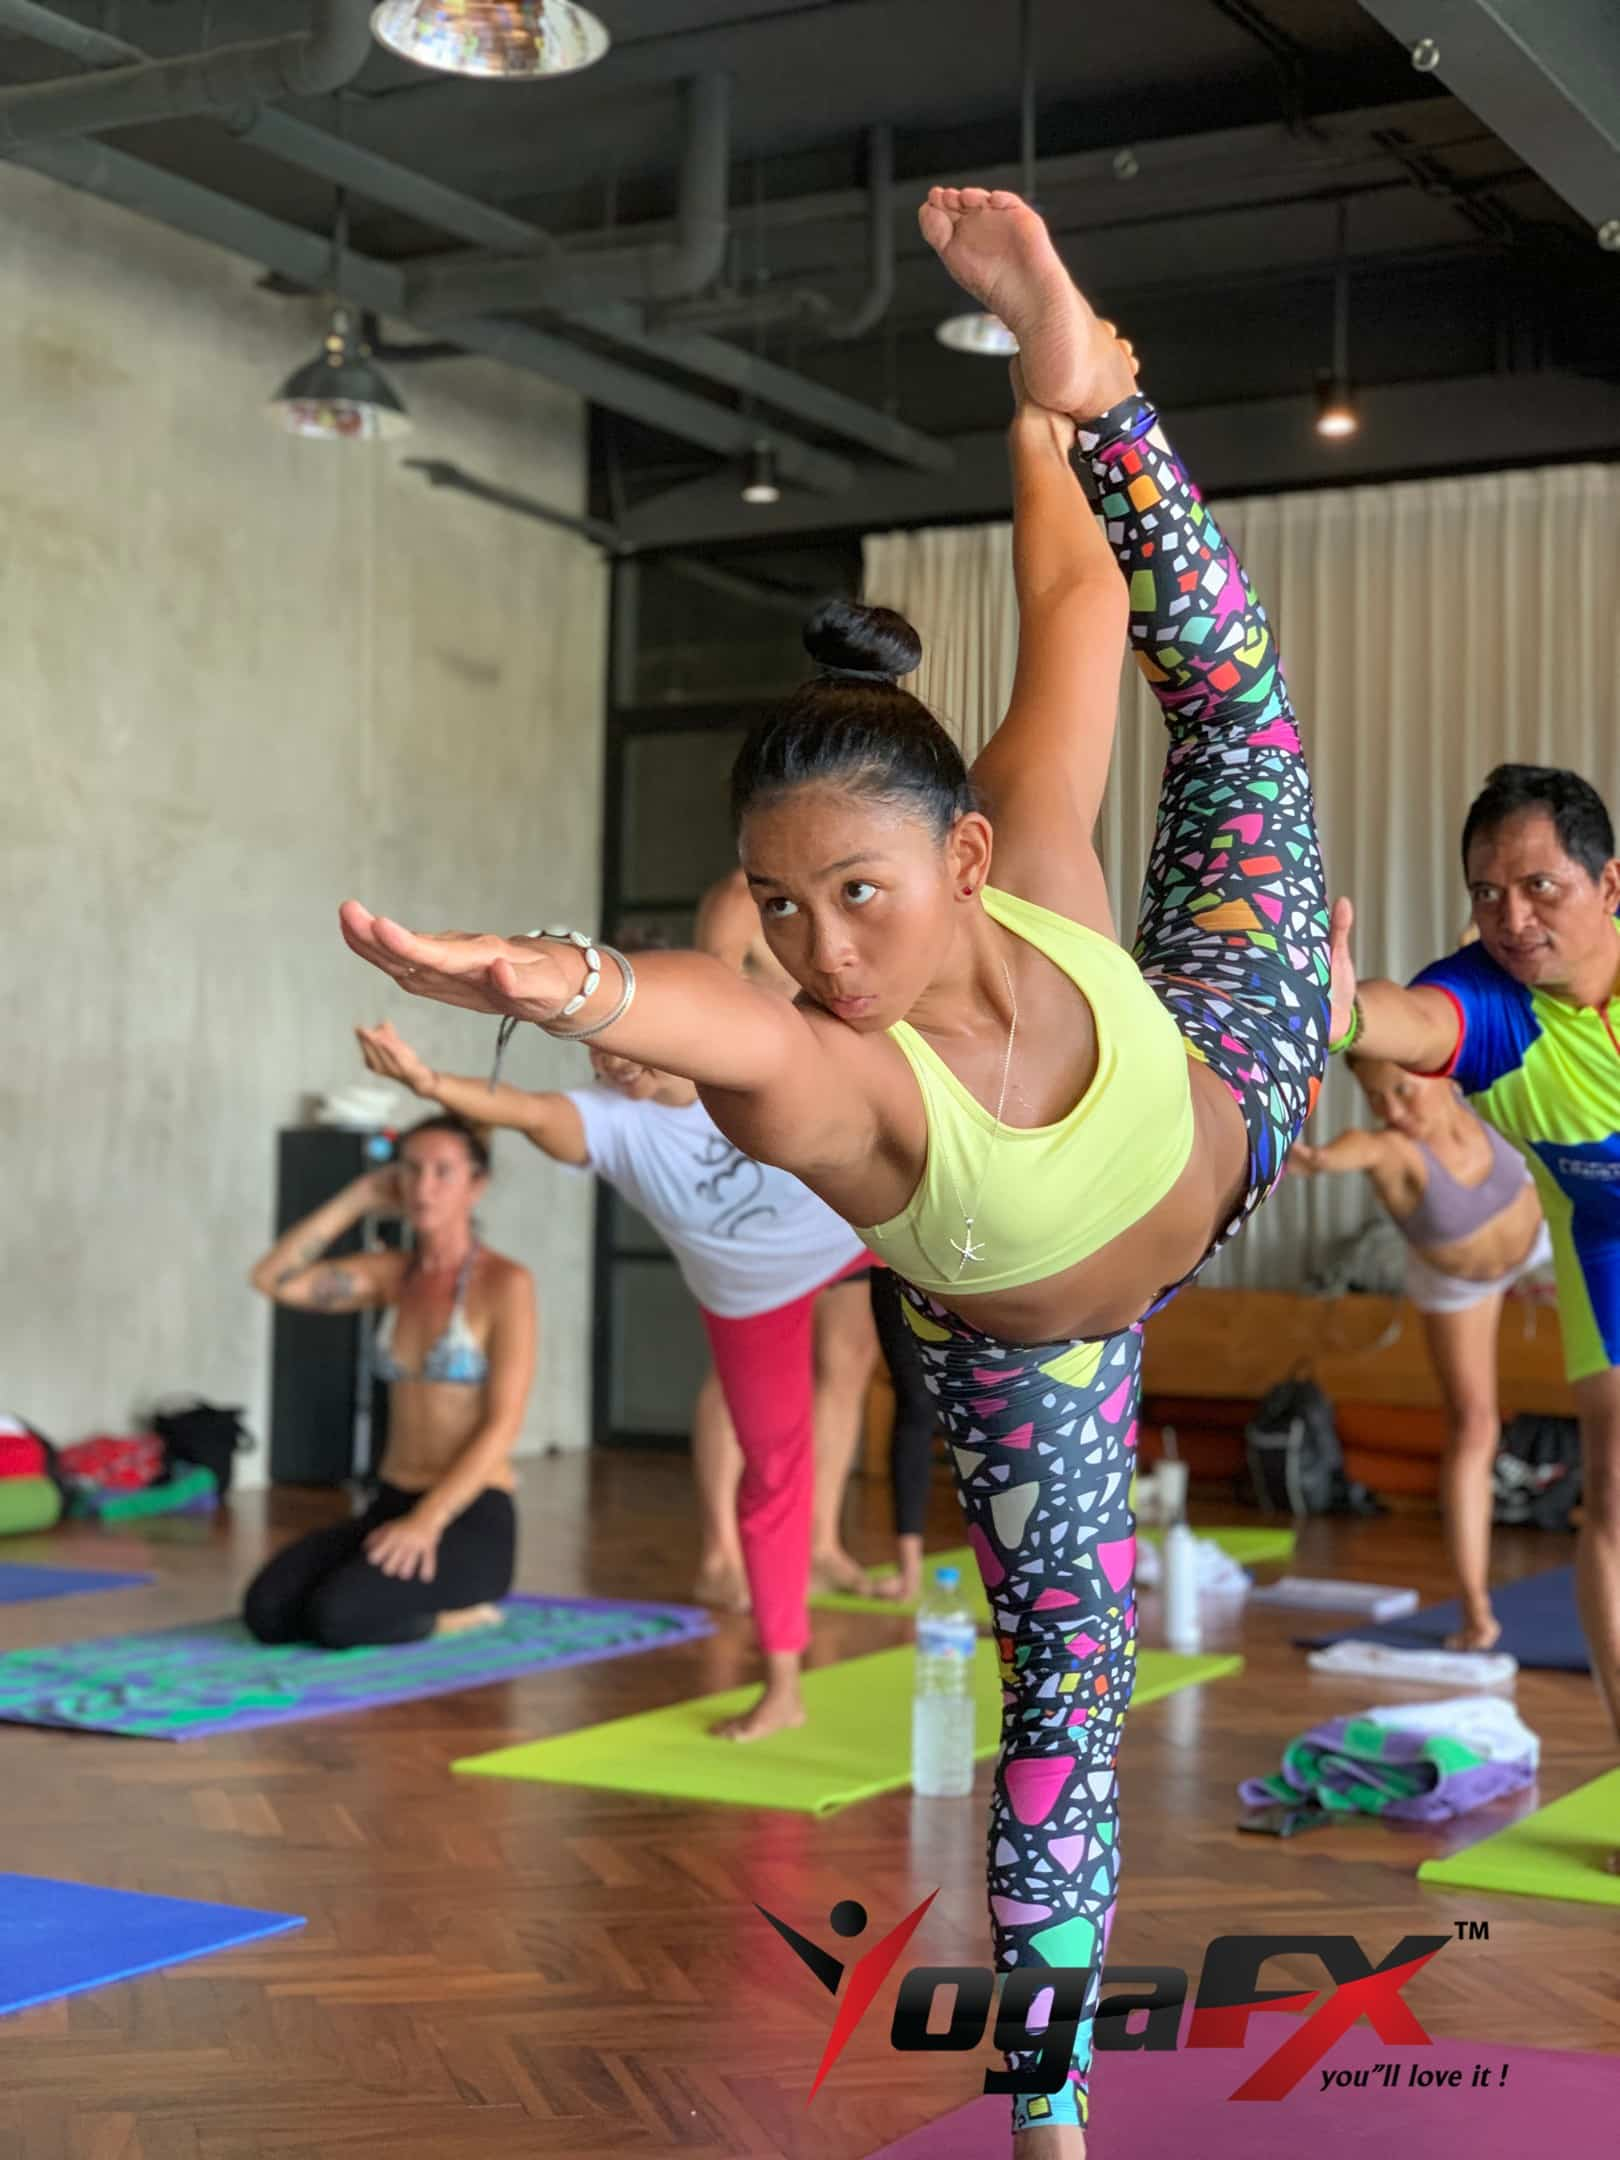 bikram yoga sequence